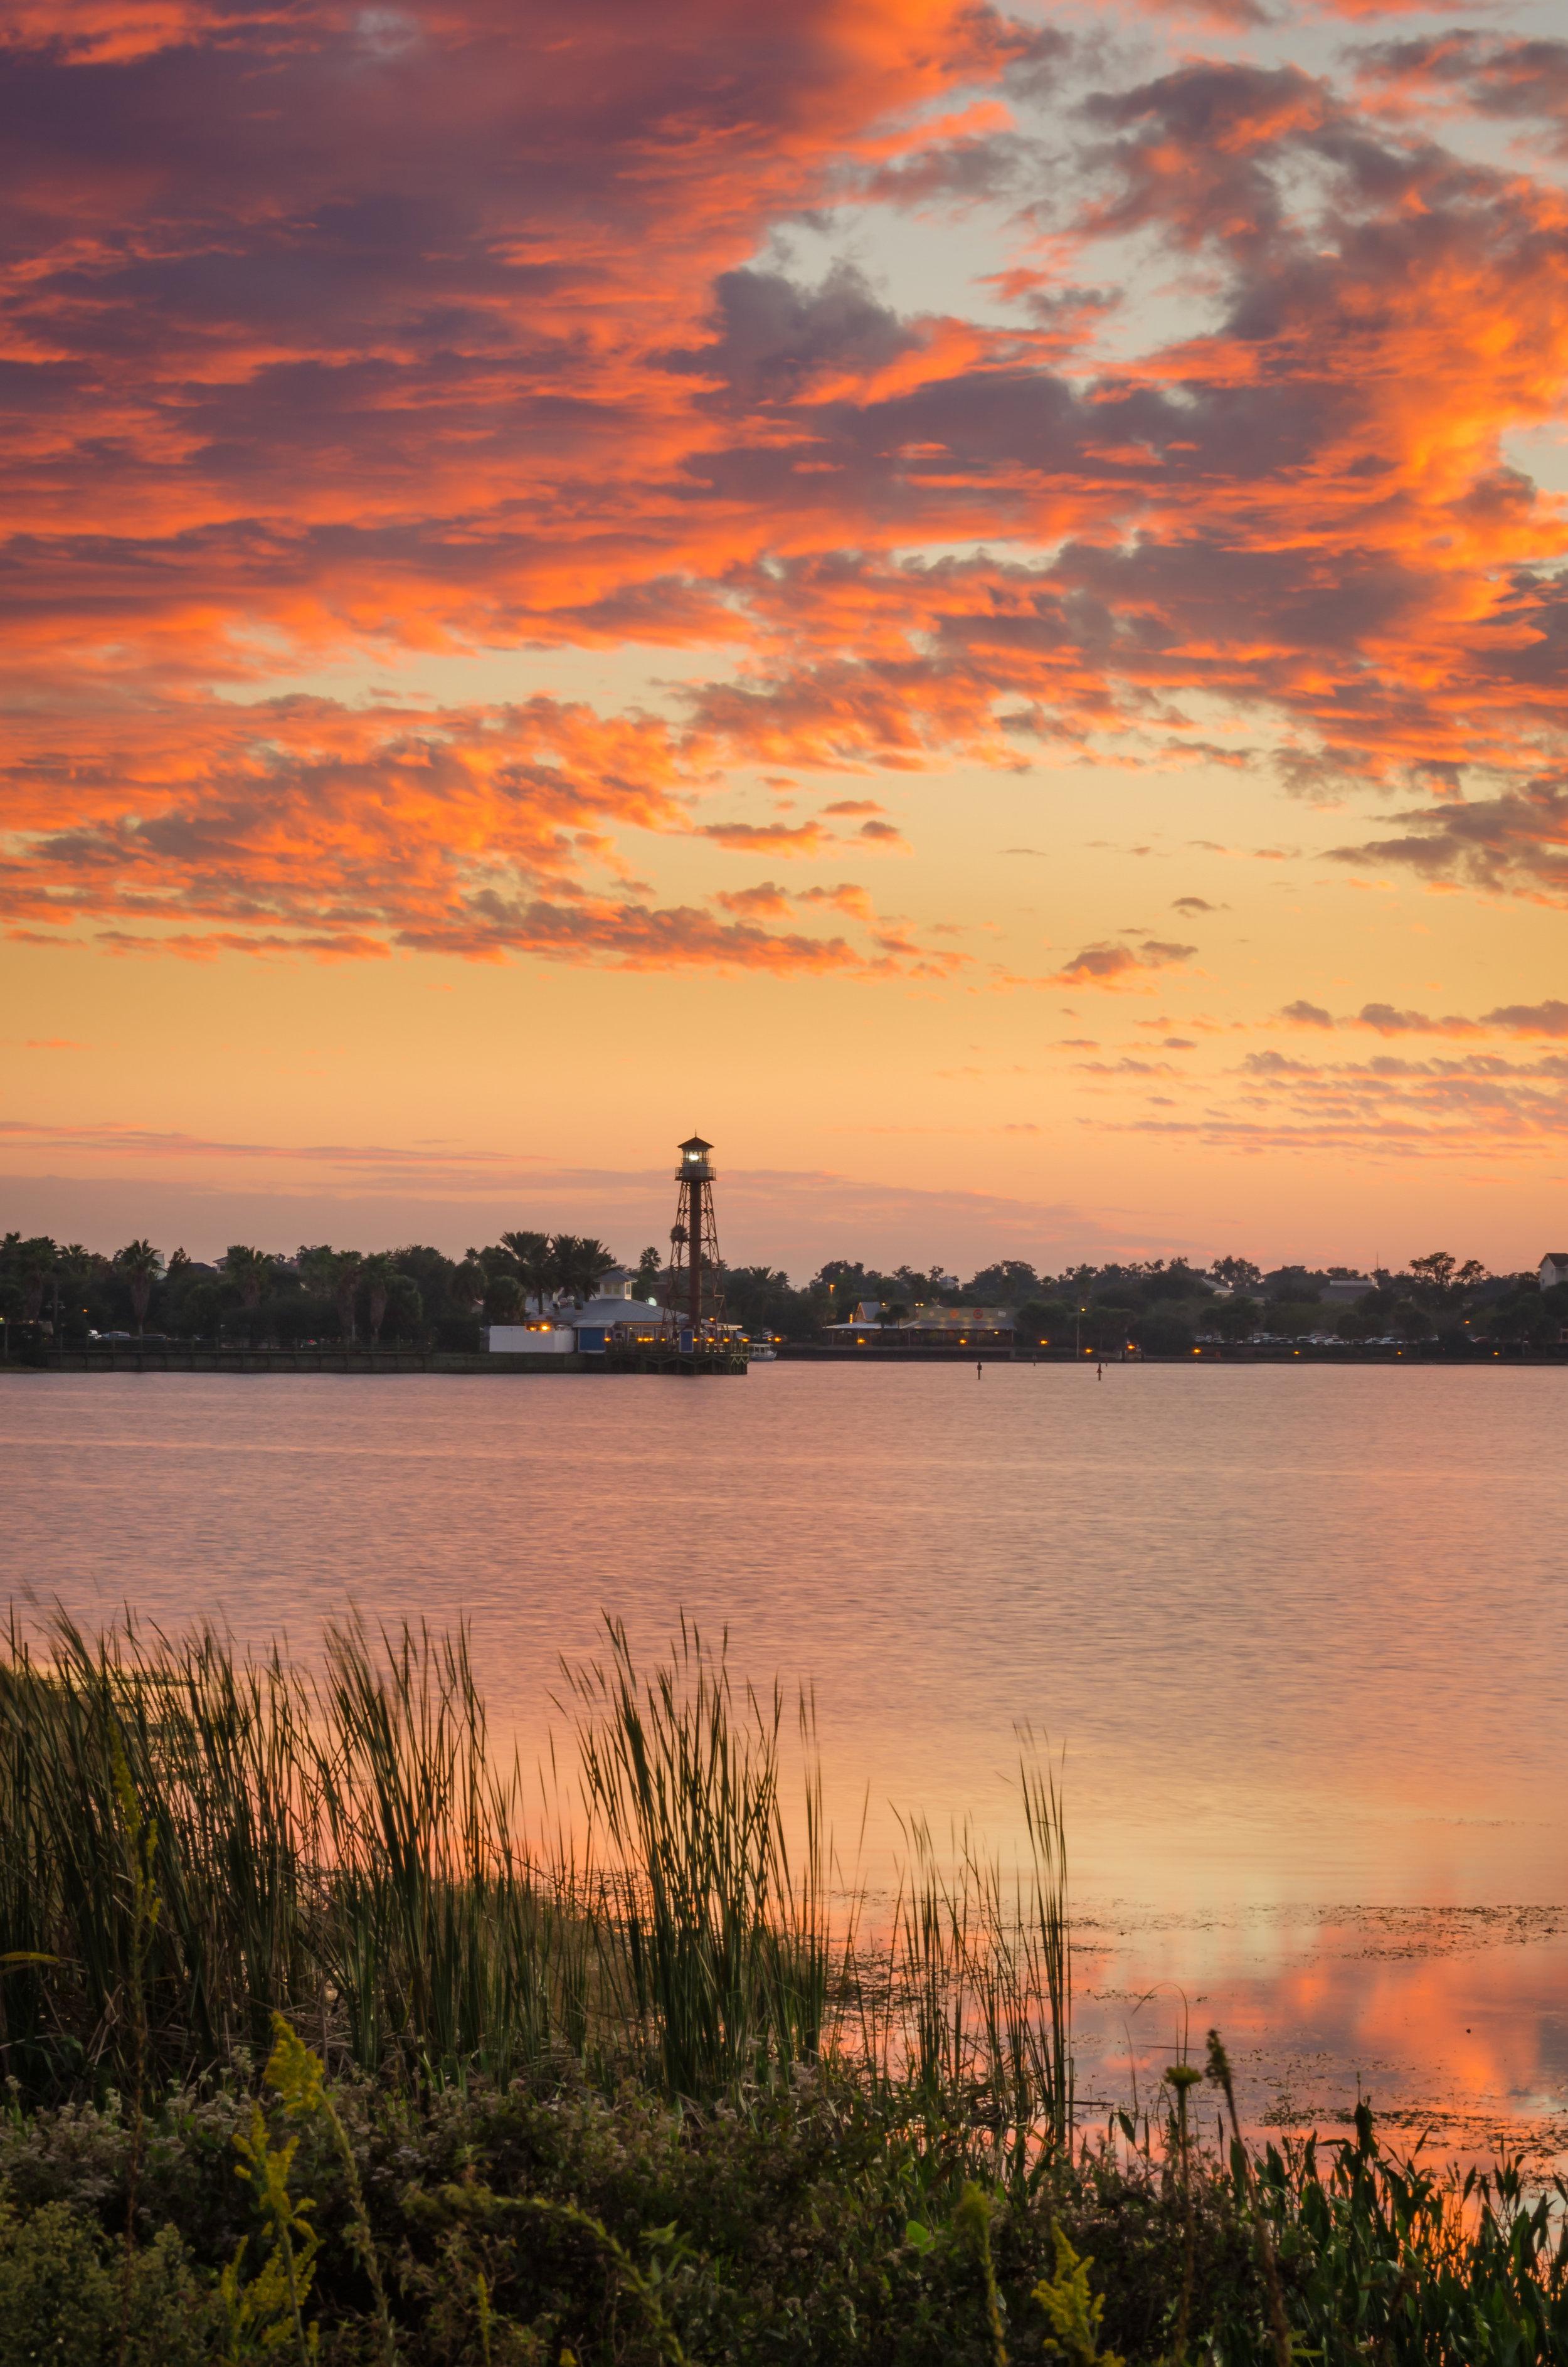 lake sumter-sunset-the villages-florida-lighthouse.jpg